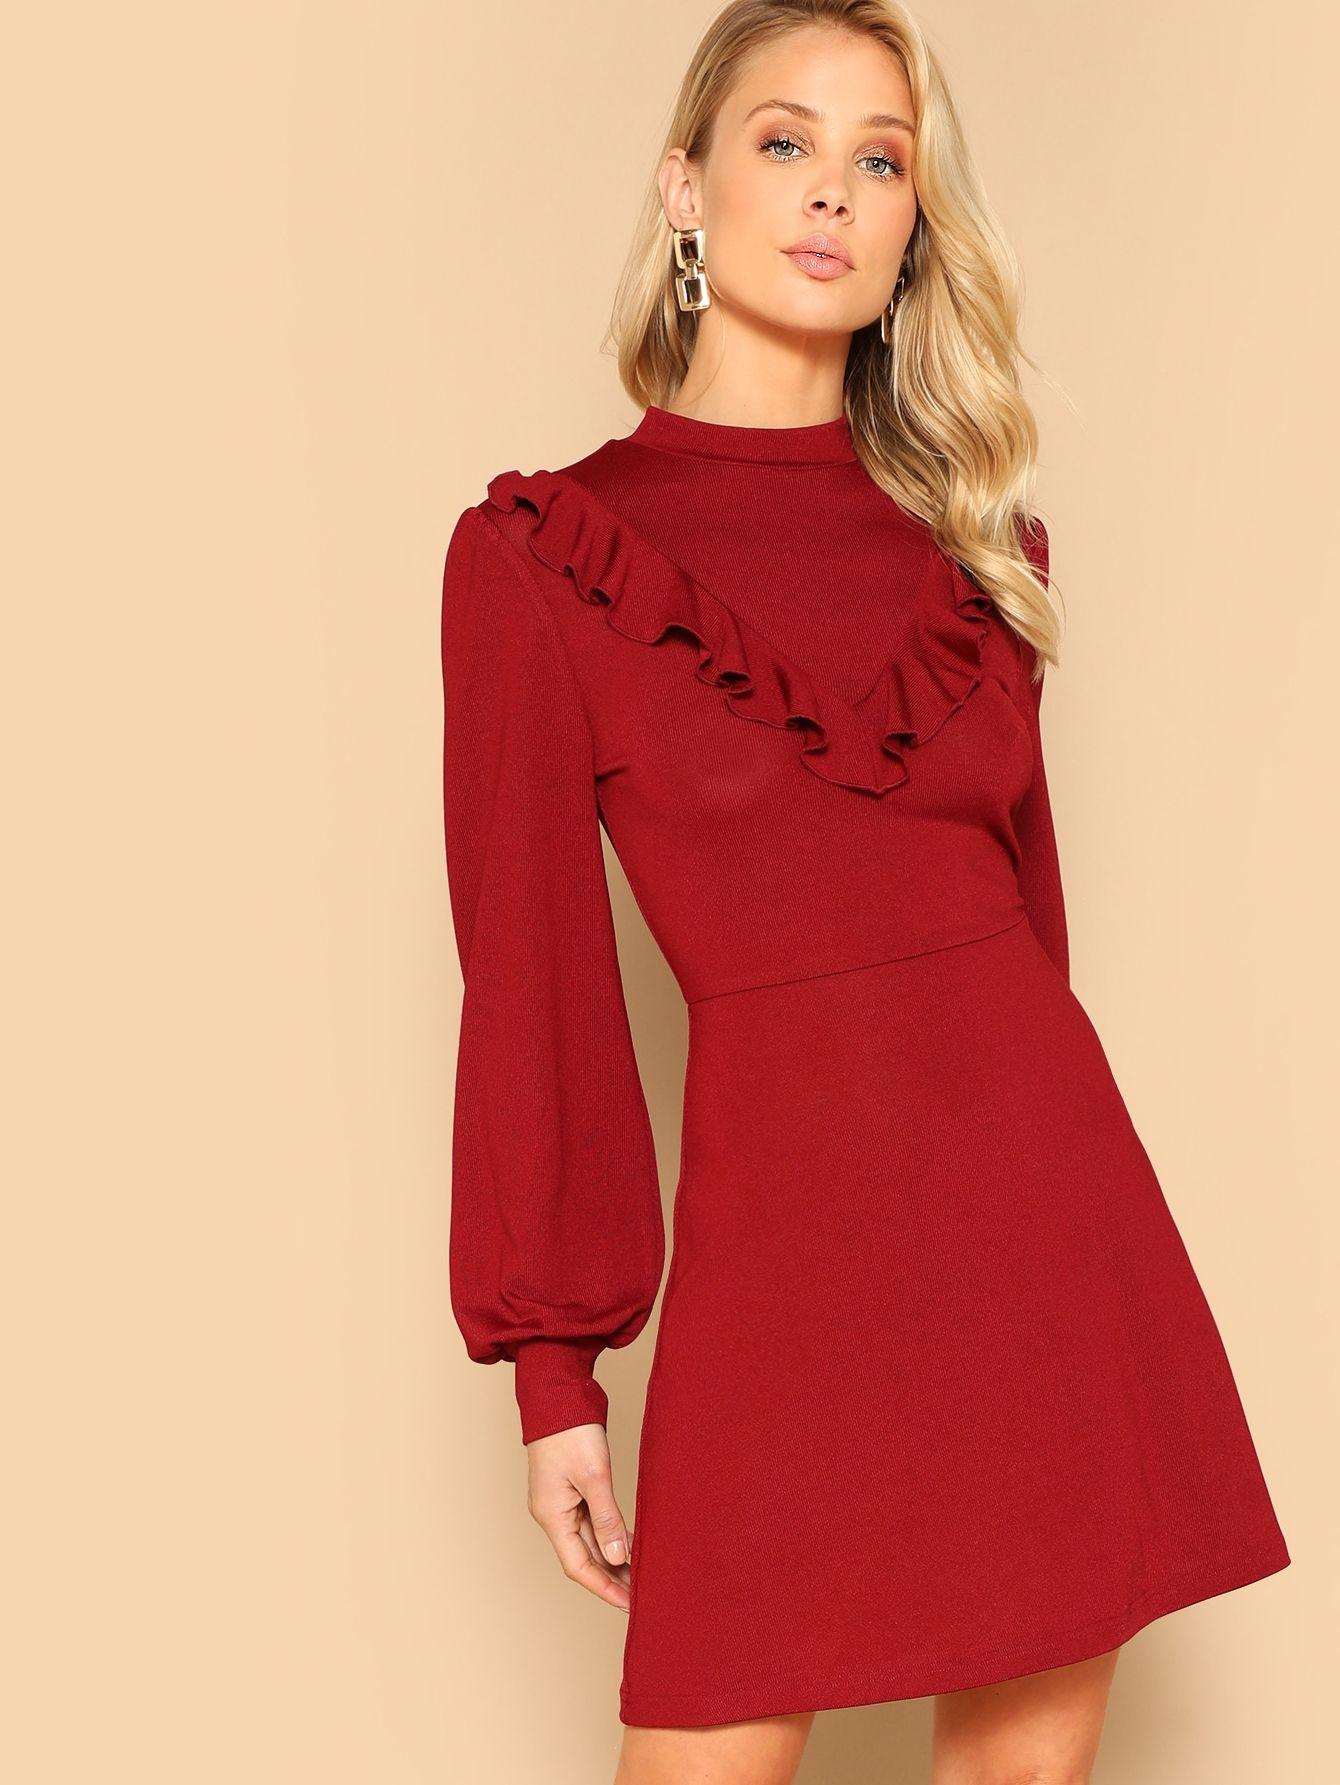 Ruffle Trim Bishop Sleeve Fit Flare Dress Check Out This Ruffle Trim Bishop Sleeve Fit Flare Dress On Shein Fit Flare Dress Flare Dress Fit And Flare Dress [ 1785 x 1340 Pixel ]